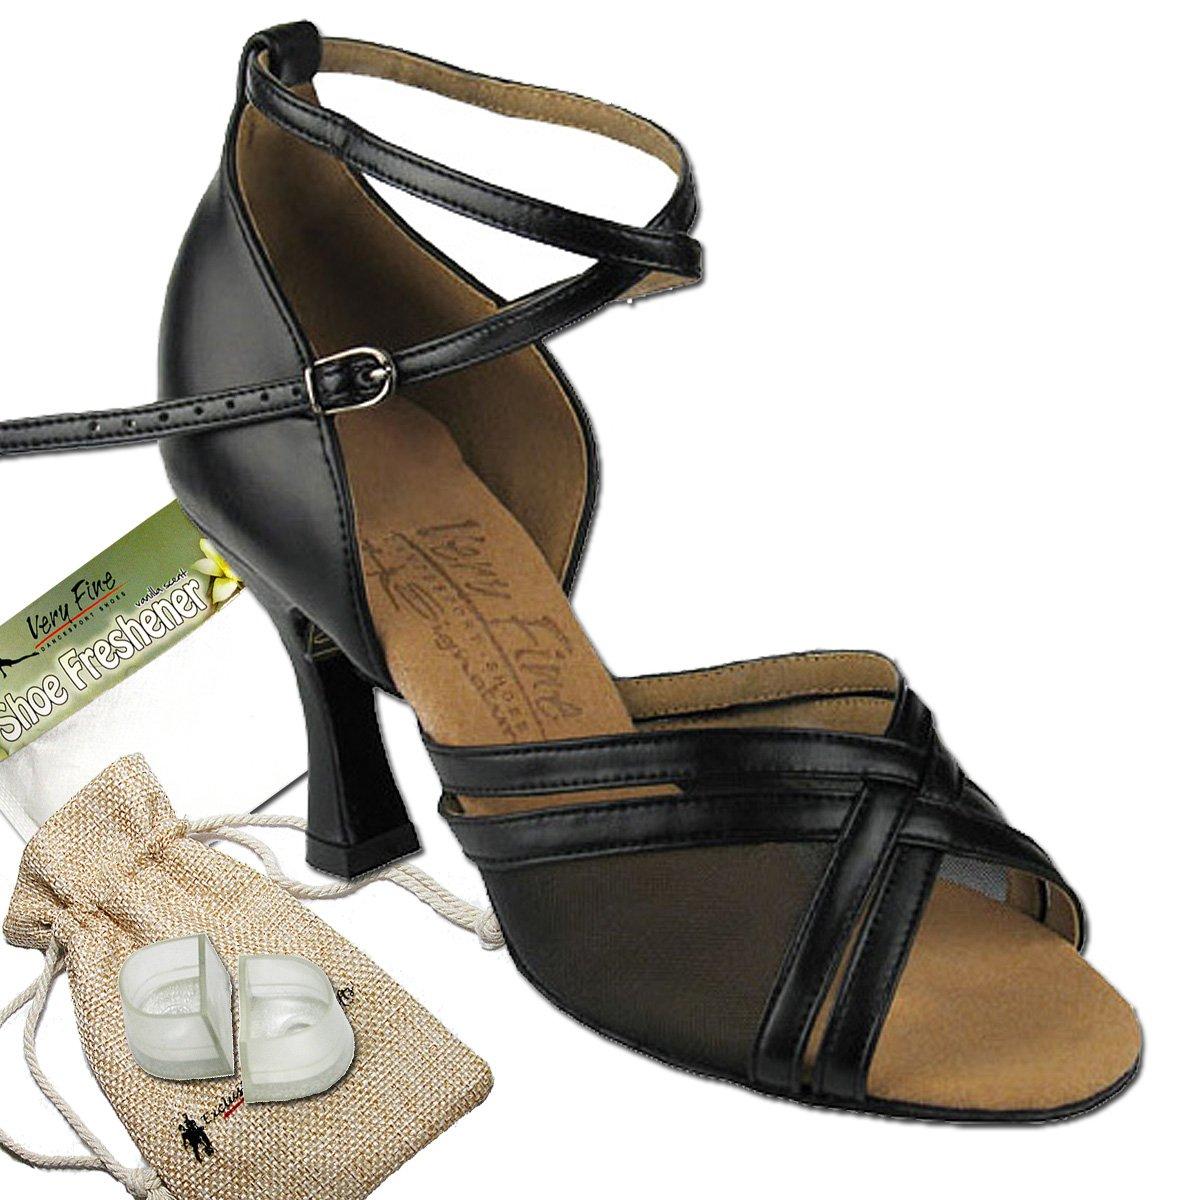 [Very Fine Dance Shoes] レディース B072K9MD1N ブラックレザー 7.5 B(M) US